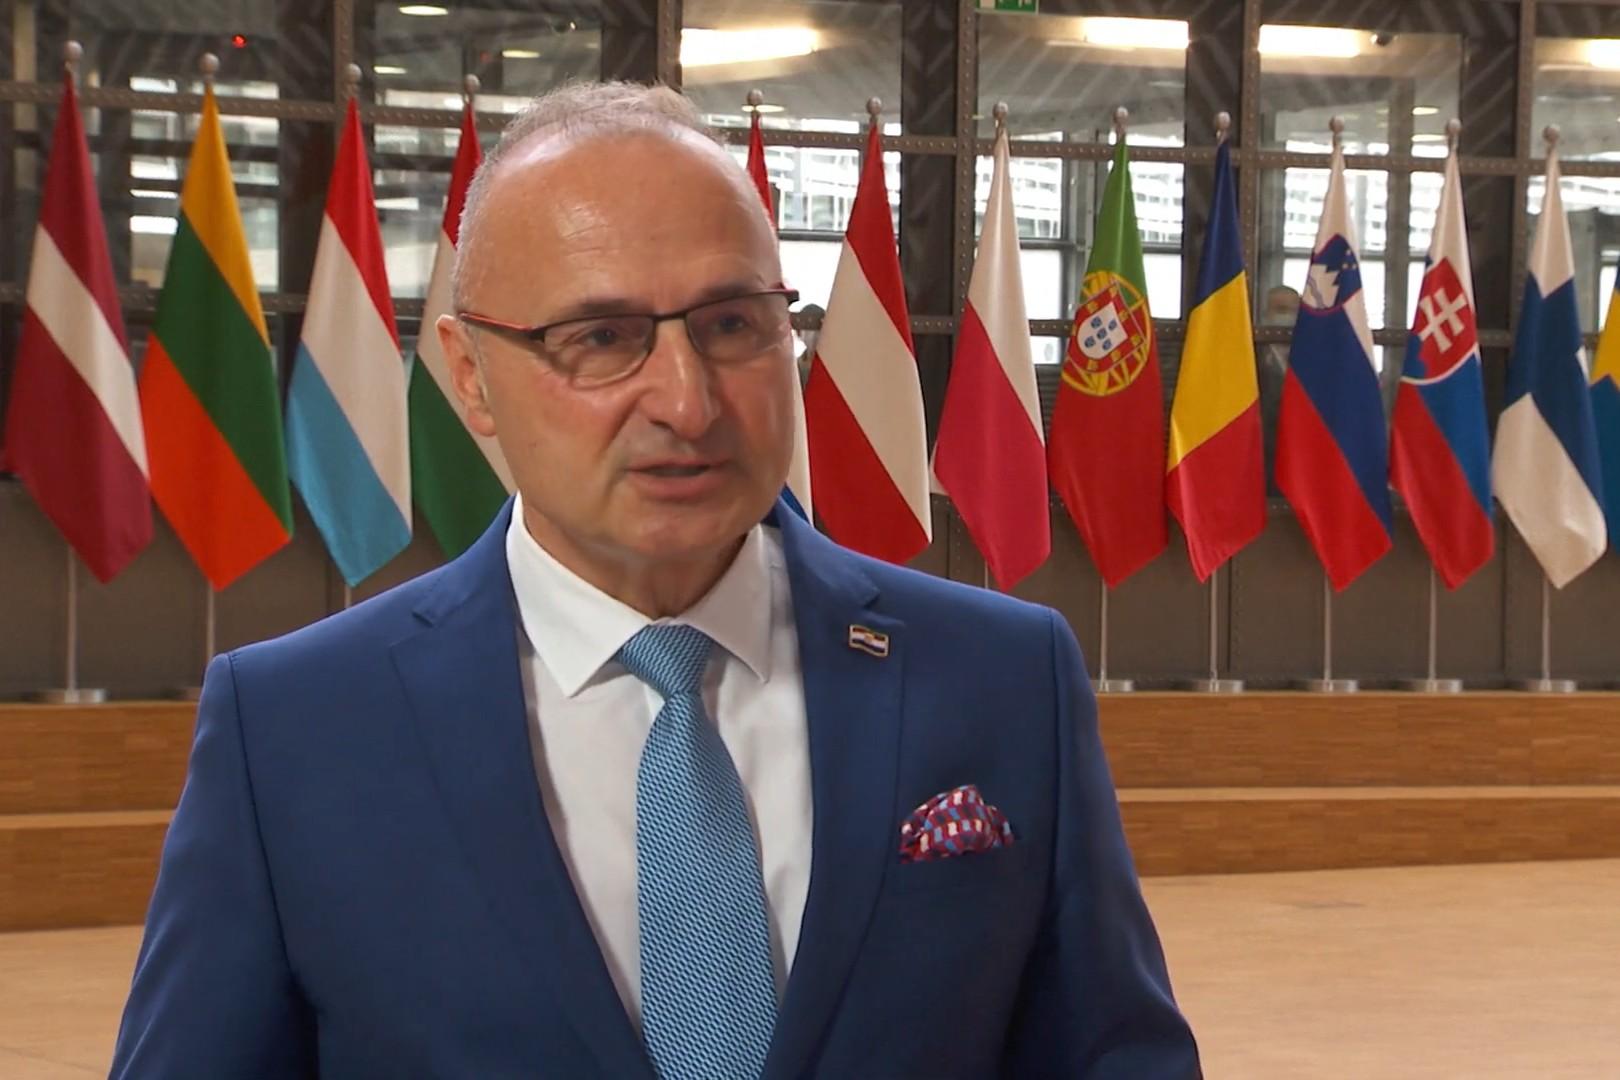 Ministar spoljnih poslova Hrvatske Gordan Grlić Radman (Foto: Snimak ekrana/Jutjub/EU Debates | eudebates.tv)